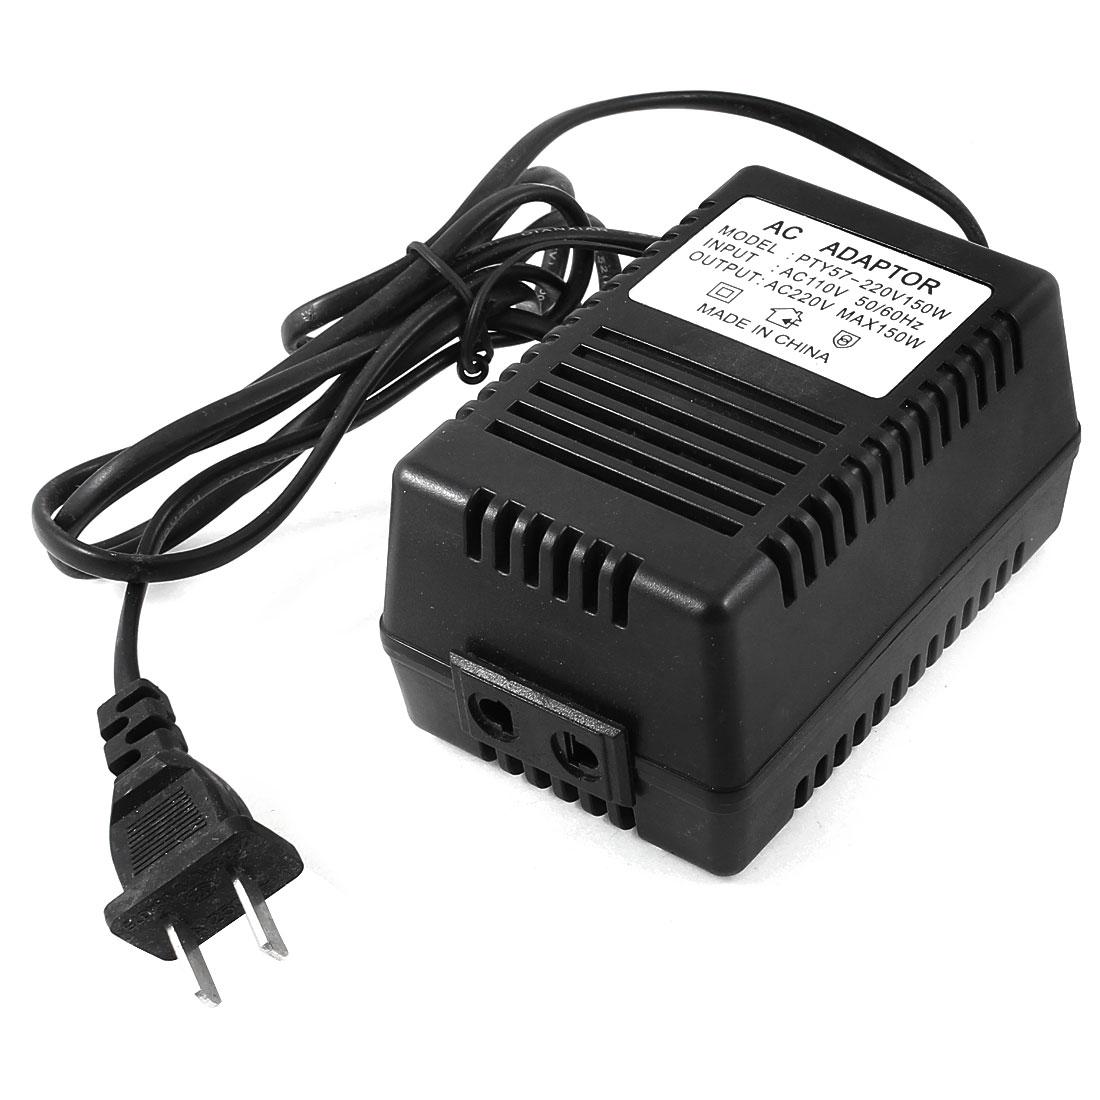 US Plug AC110V to AC220V 150W Adapter Power Converter Travel